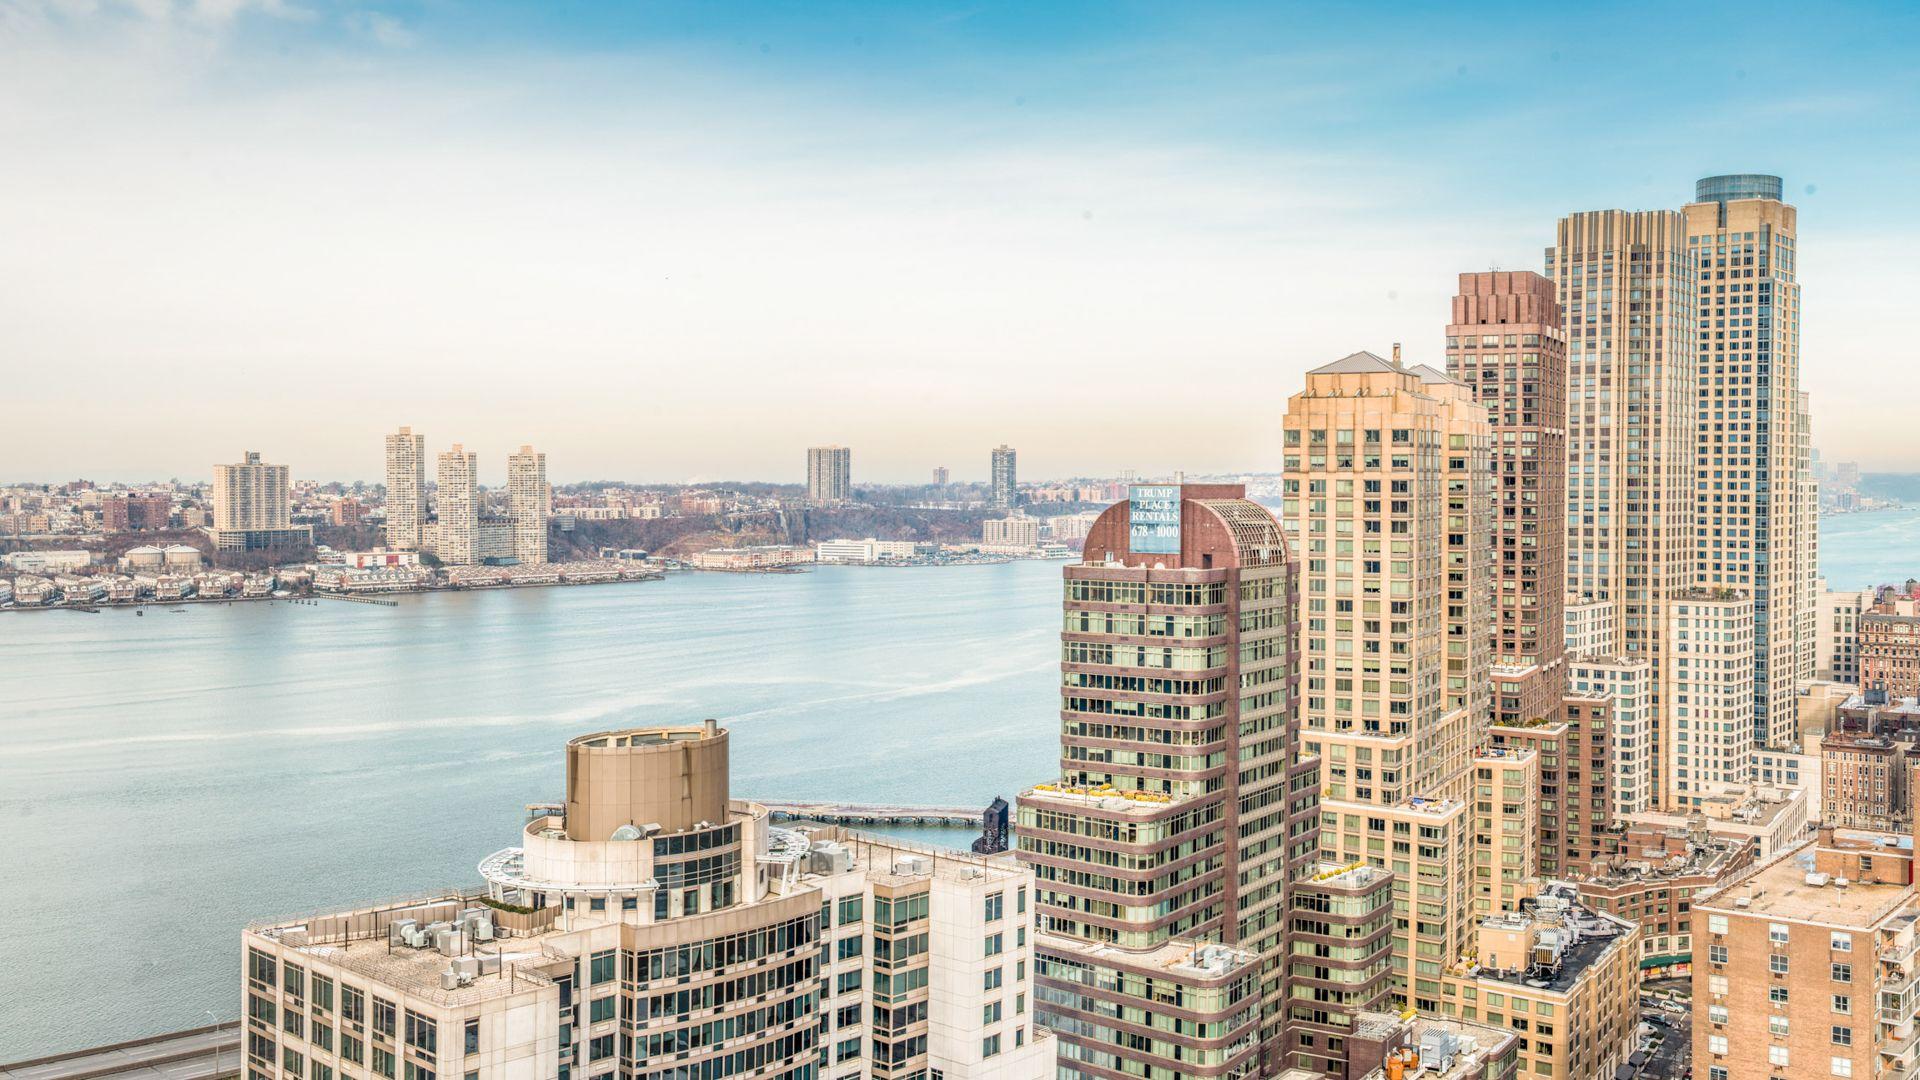 101 West End Apartments - River View